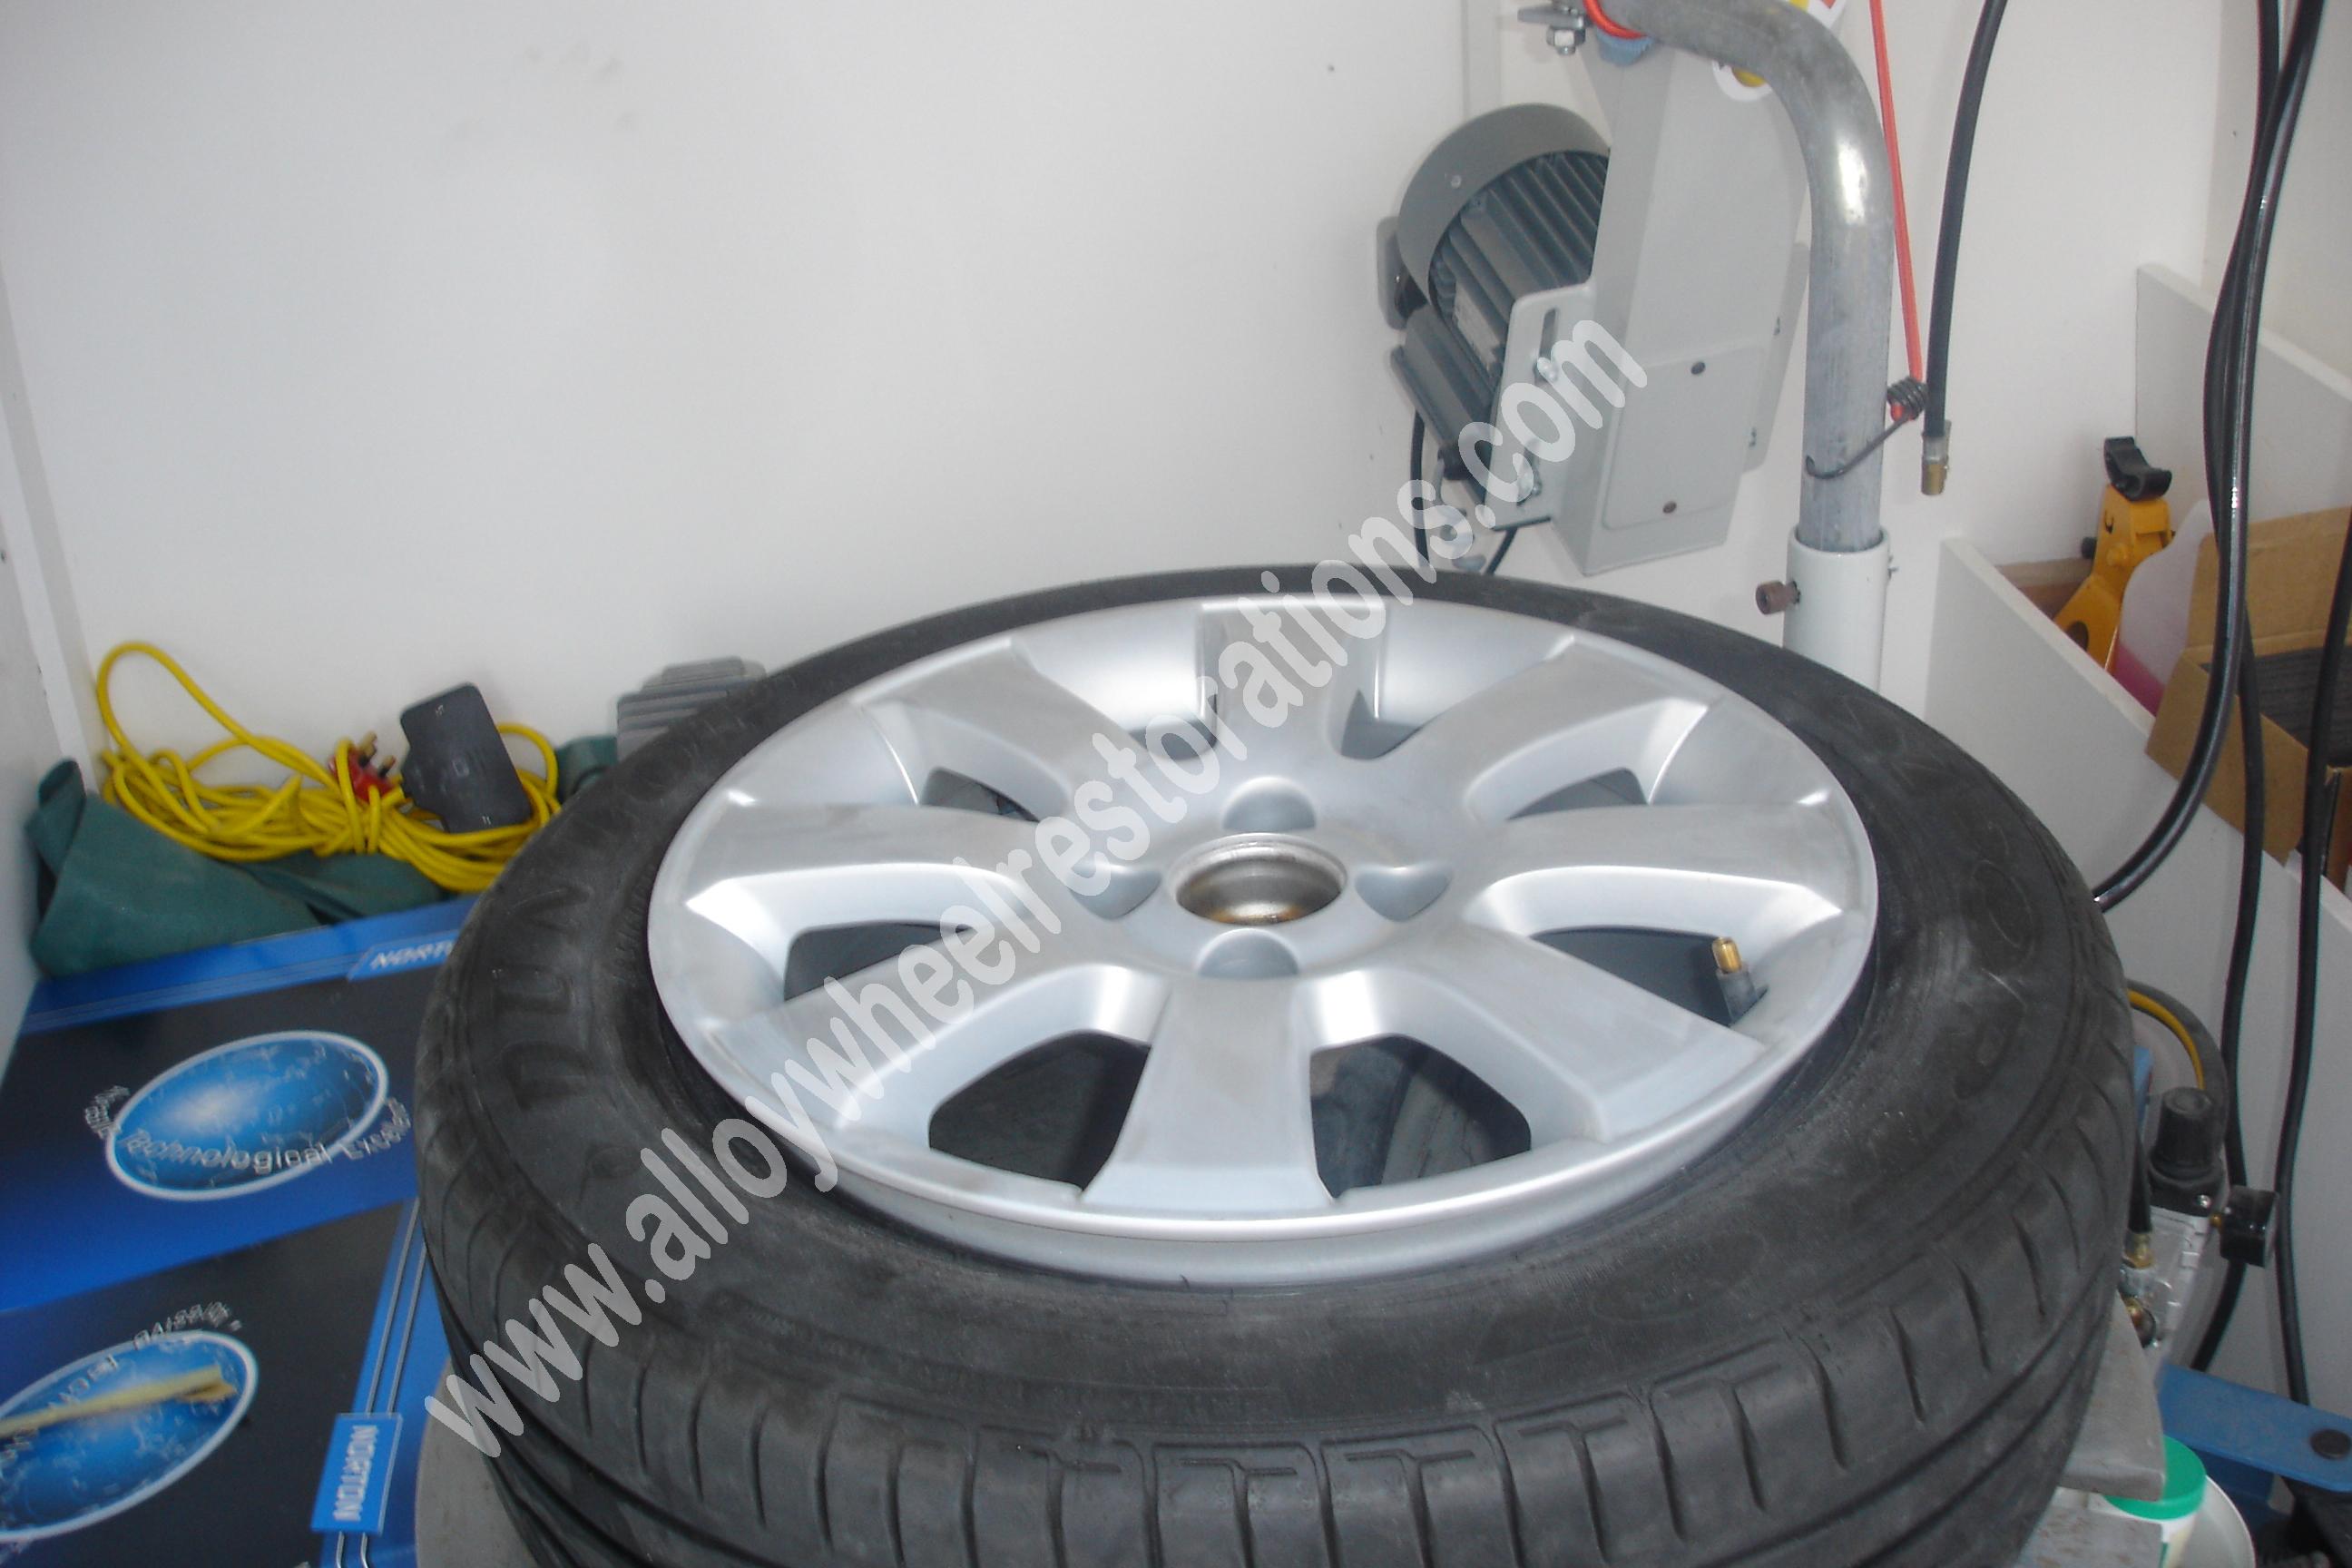 wheel-prep-turntabe